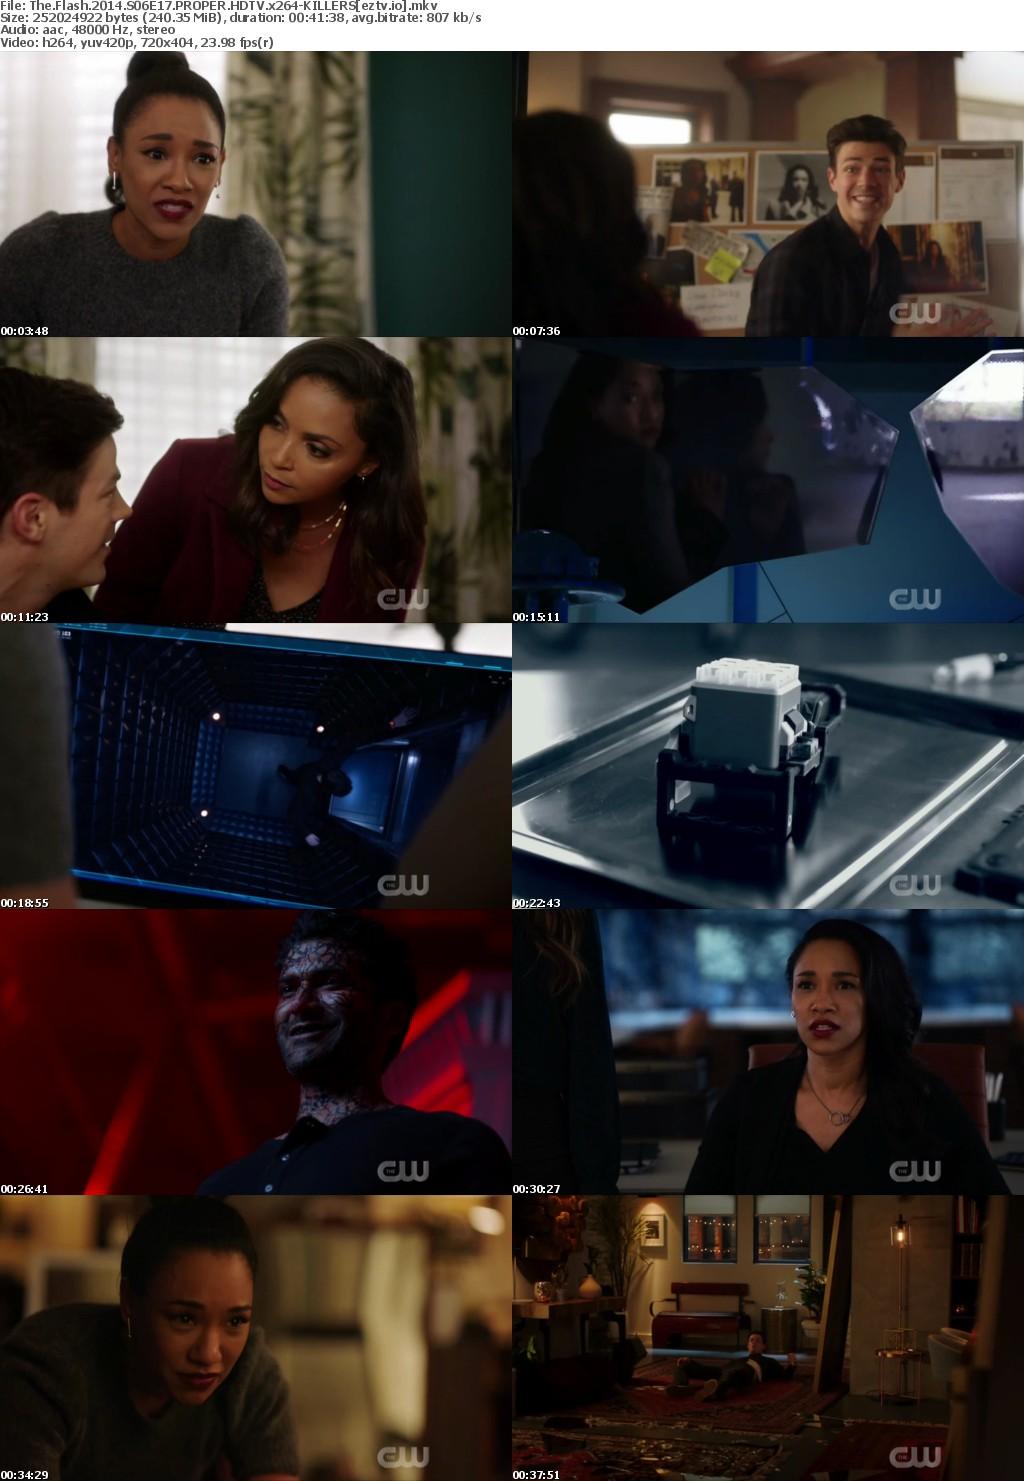 The Flash 2014 S06E17 PROPER HDTV x264-KILLERS